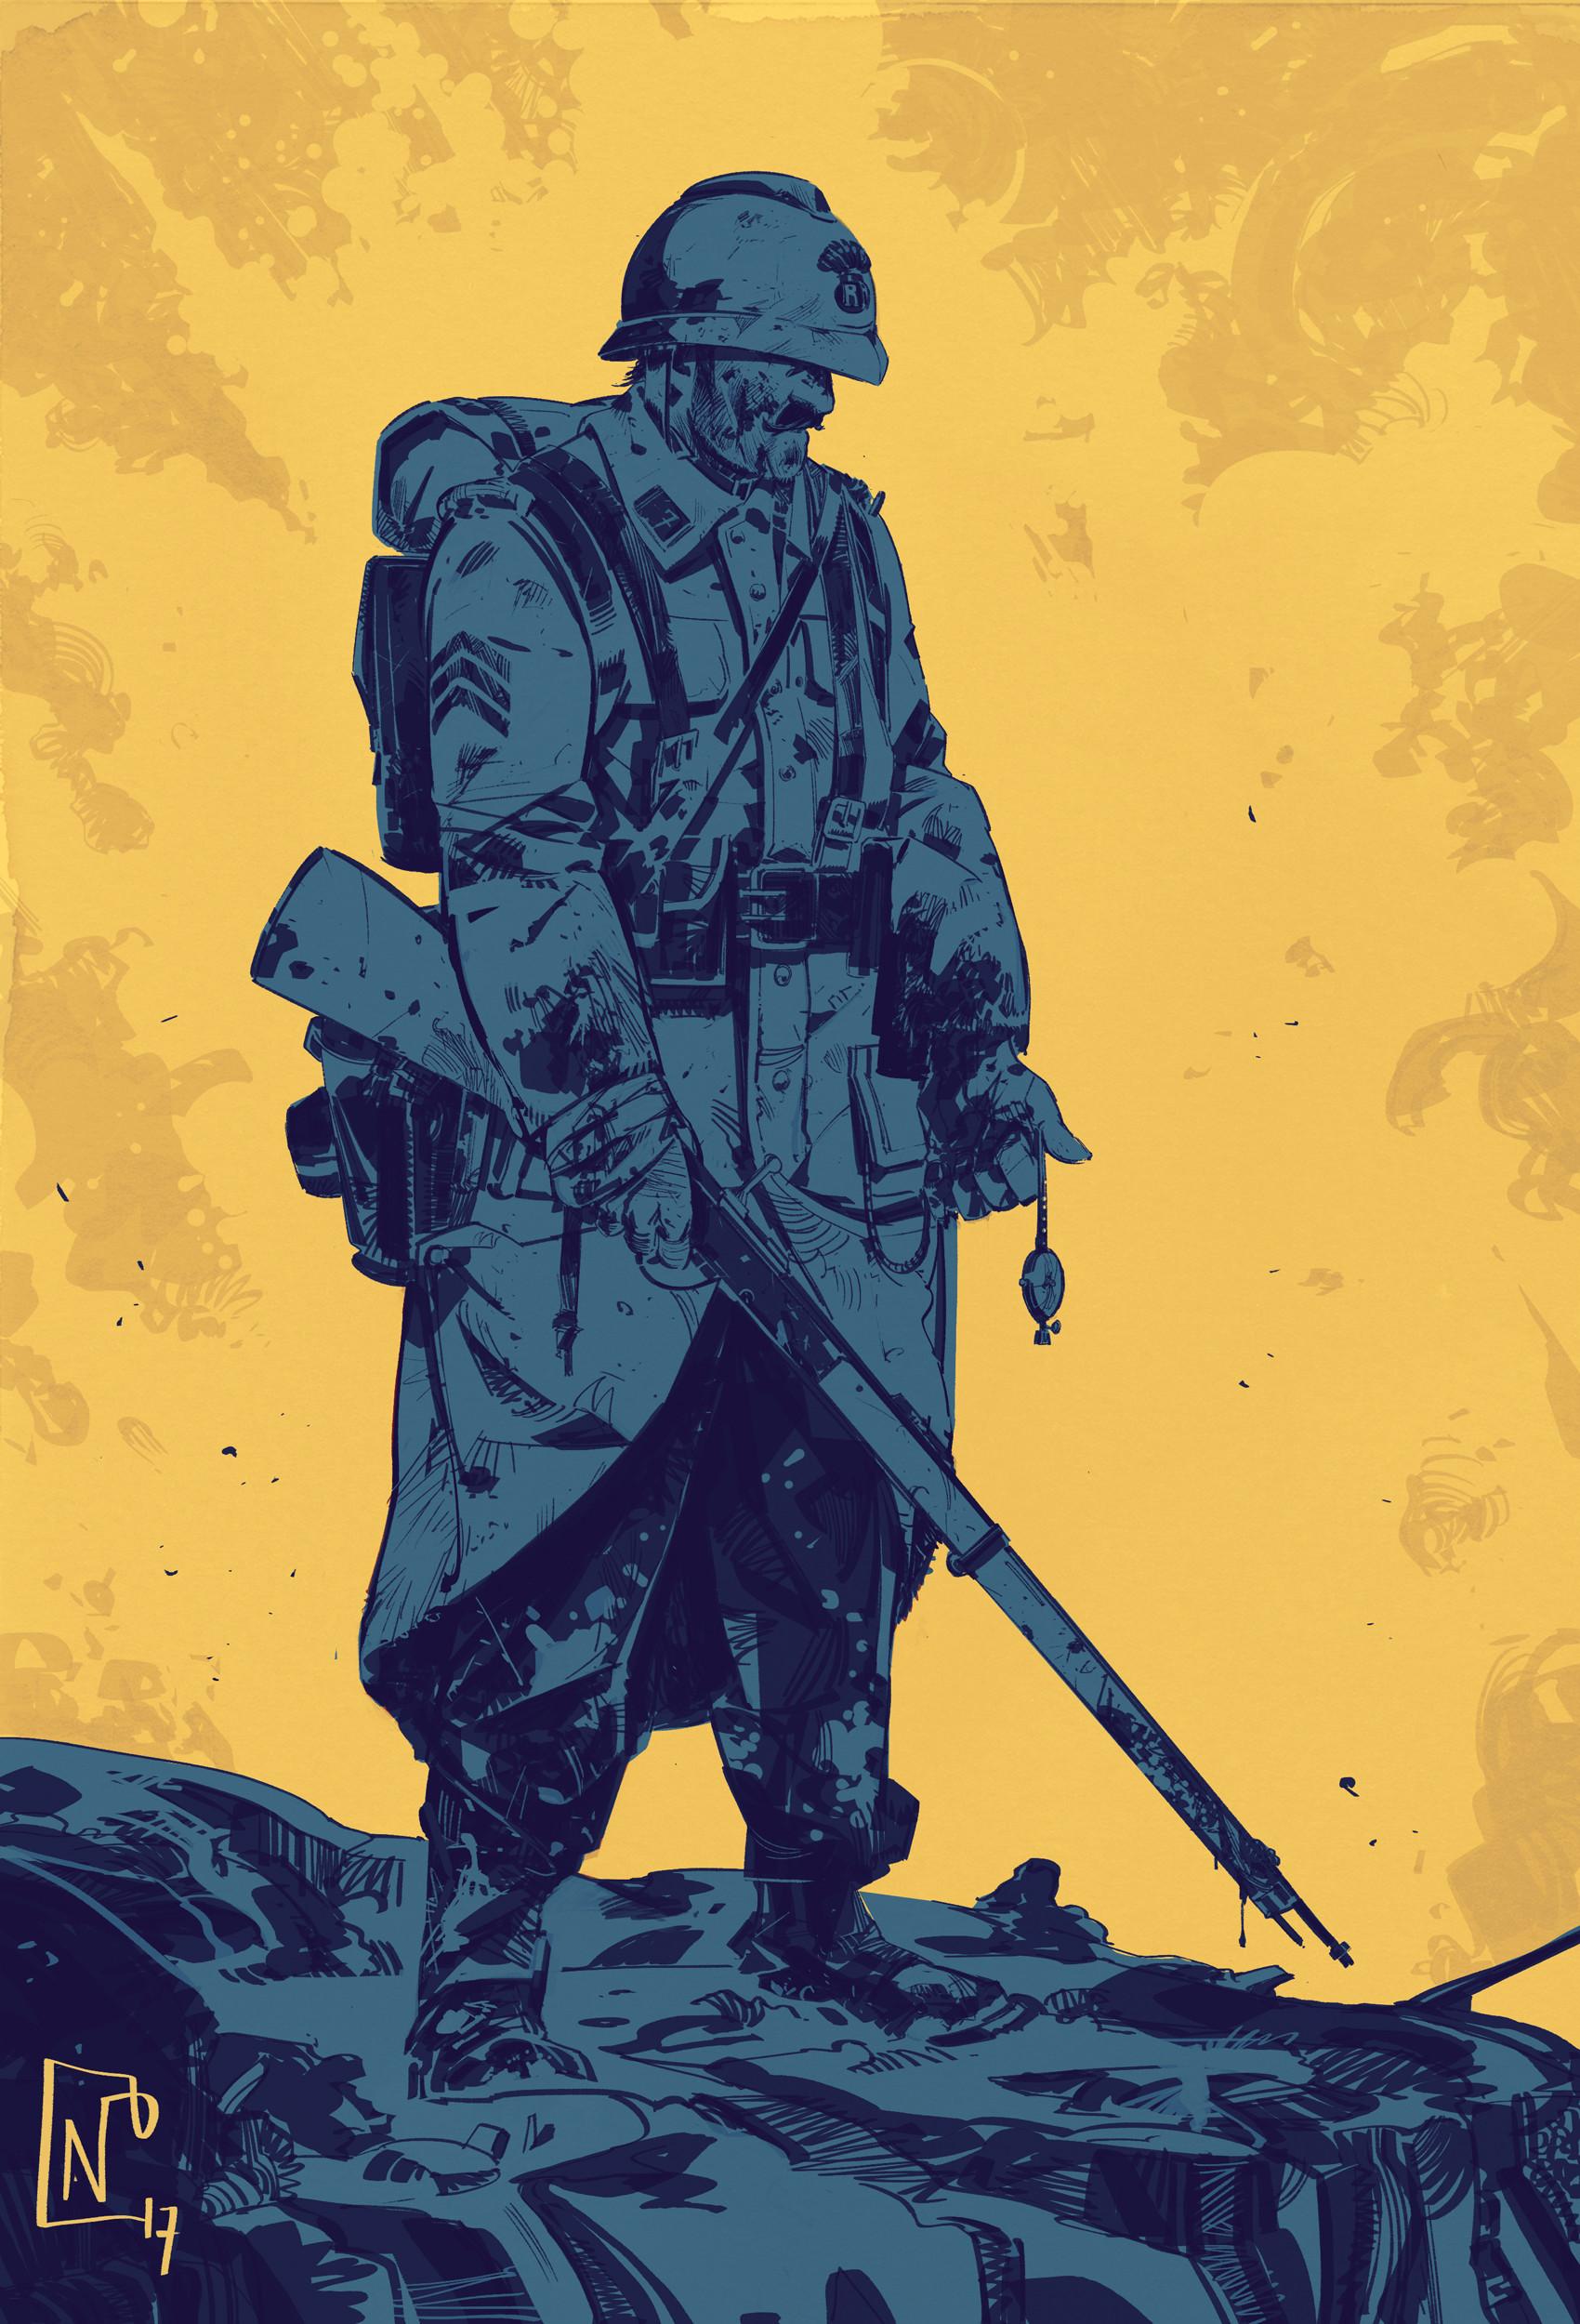 Nicolas petrimaux ww1 soldier 09